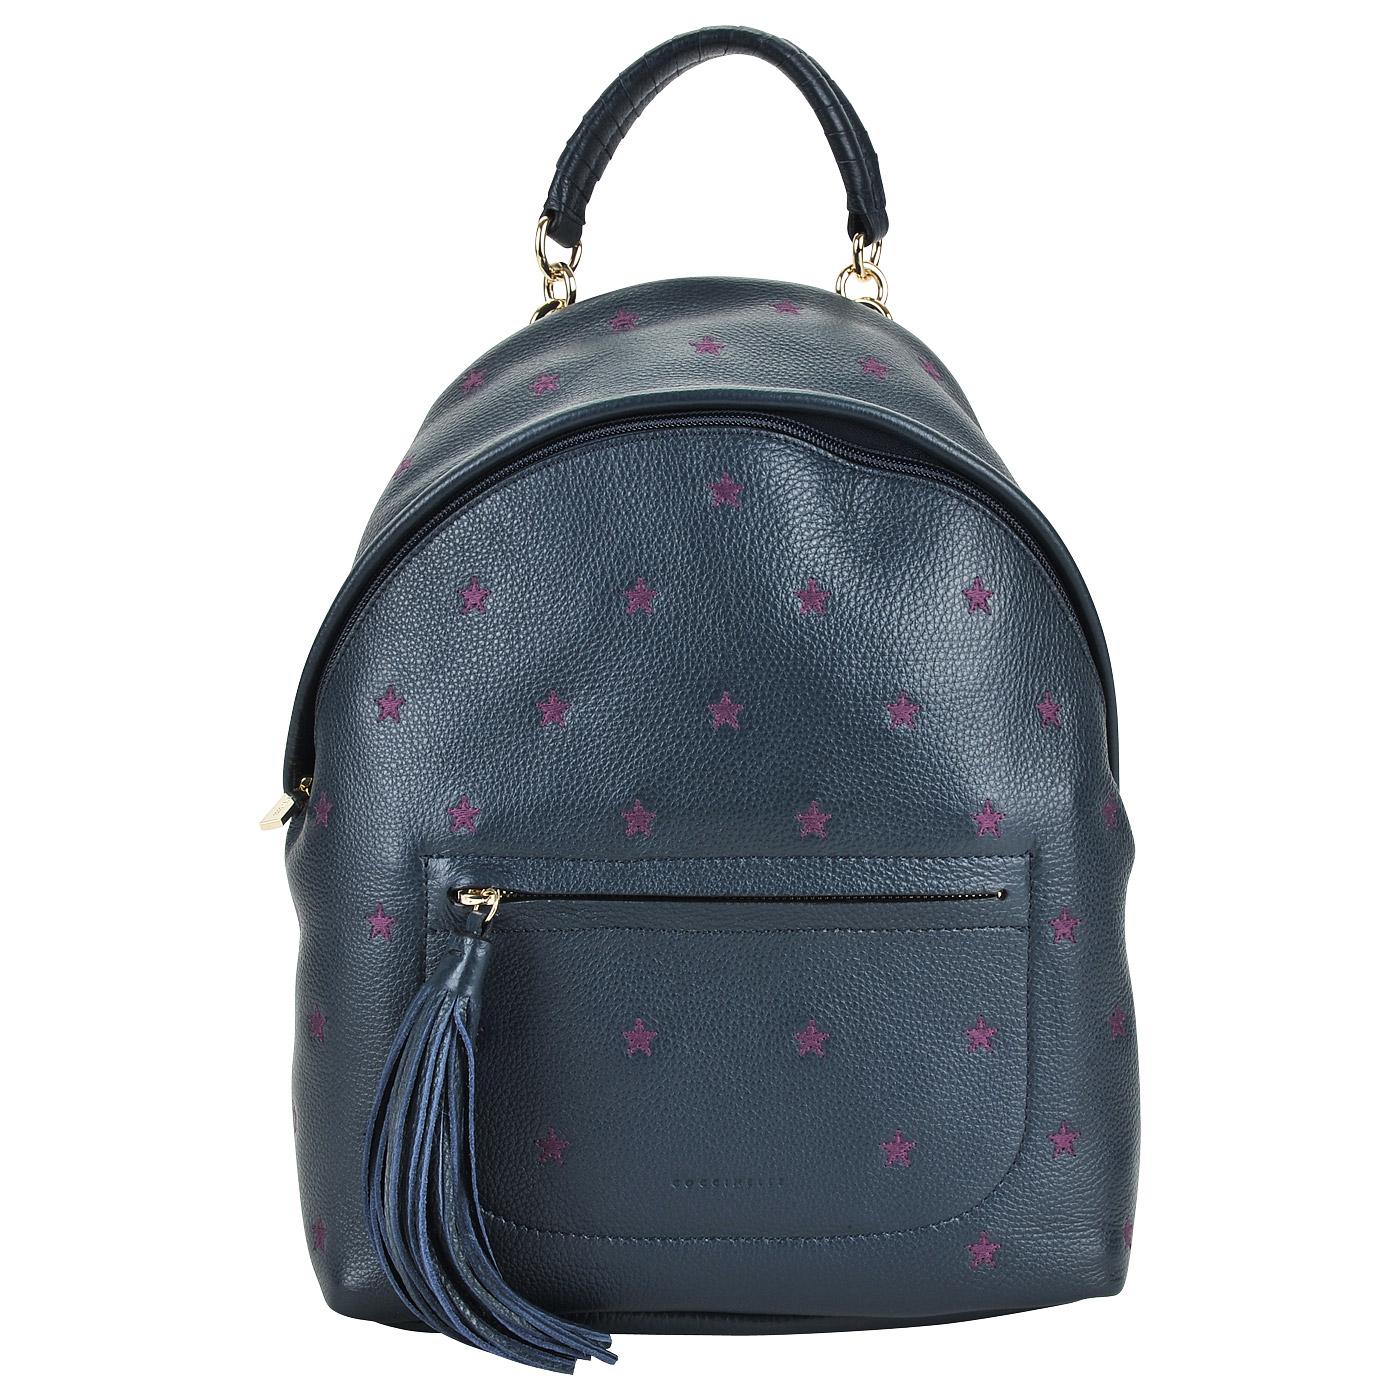 5b9df70cb985 ... Женский кожаный рюкзак с вышивкой Coccinelle Leonie embroidery ...